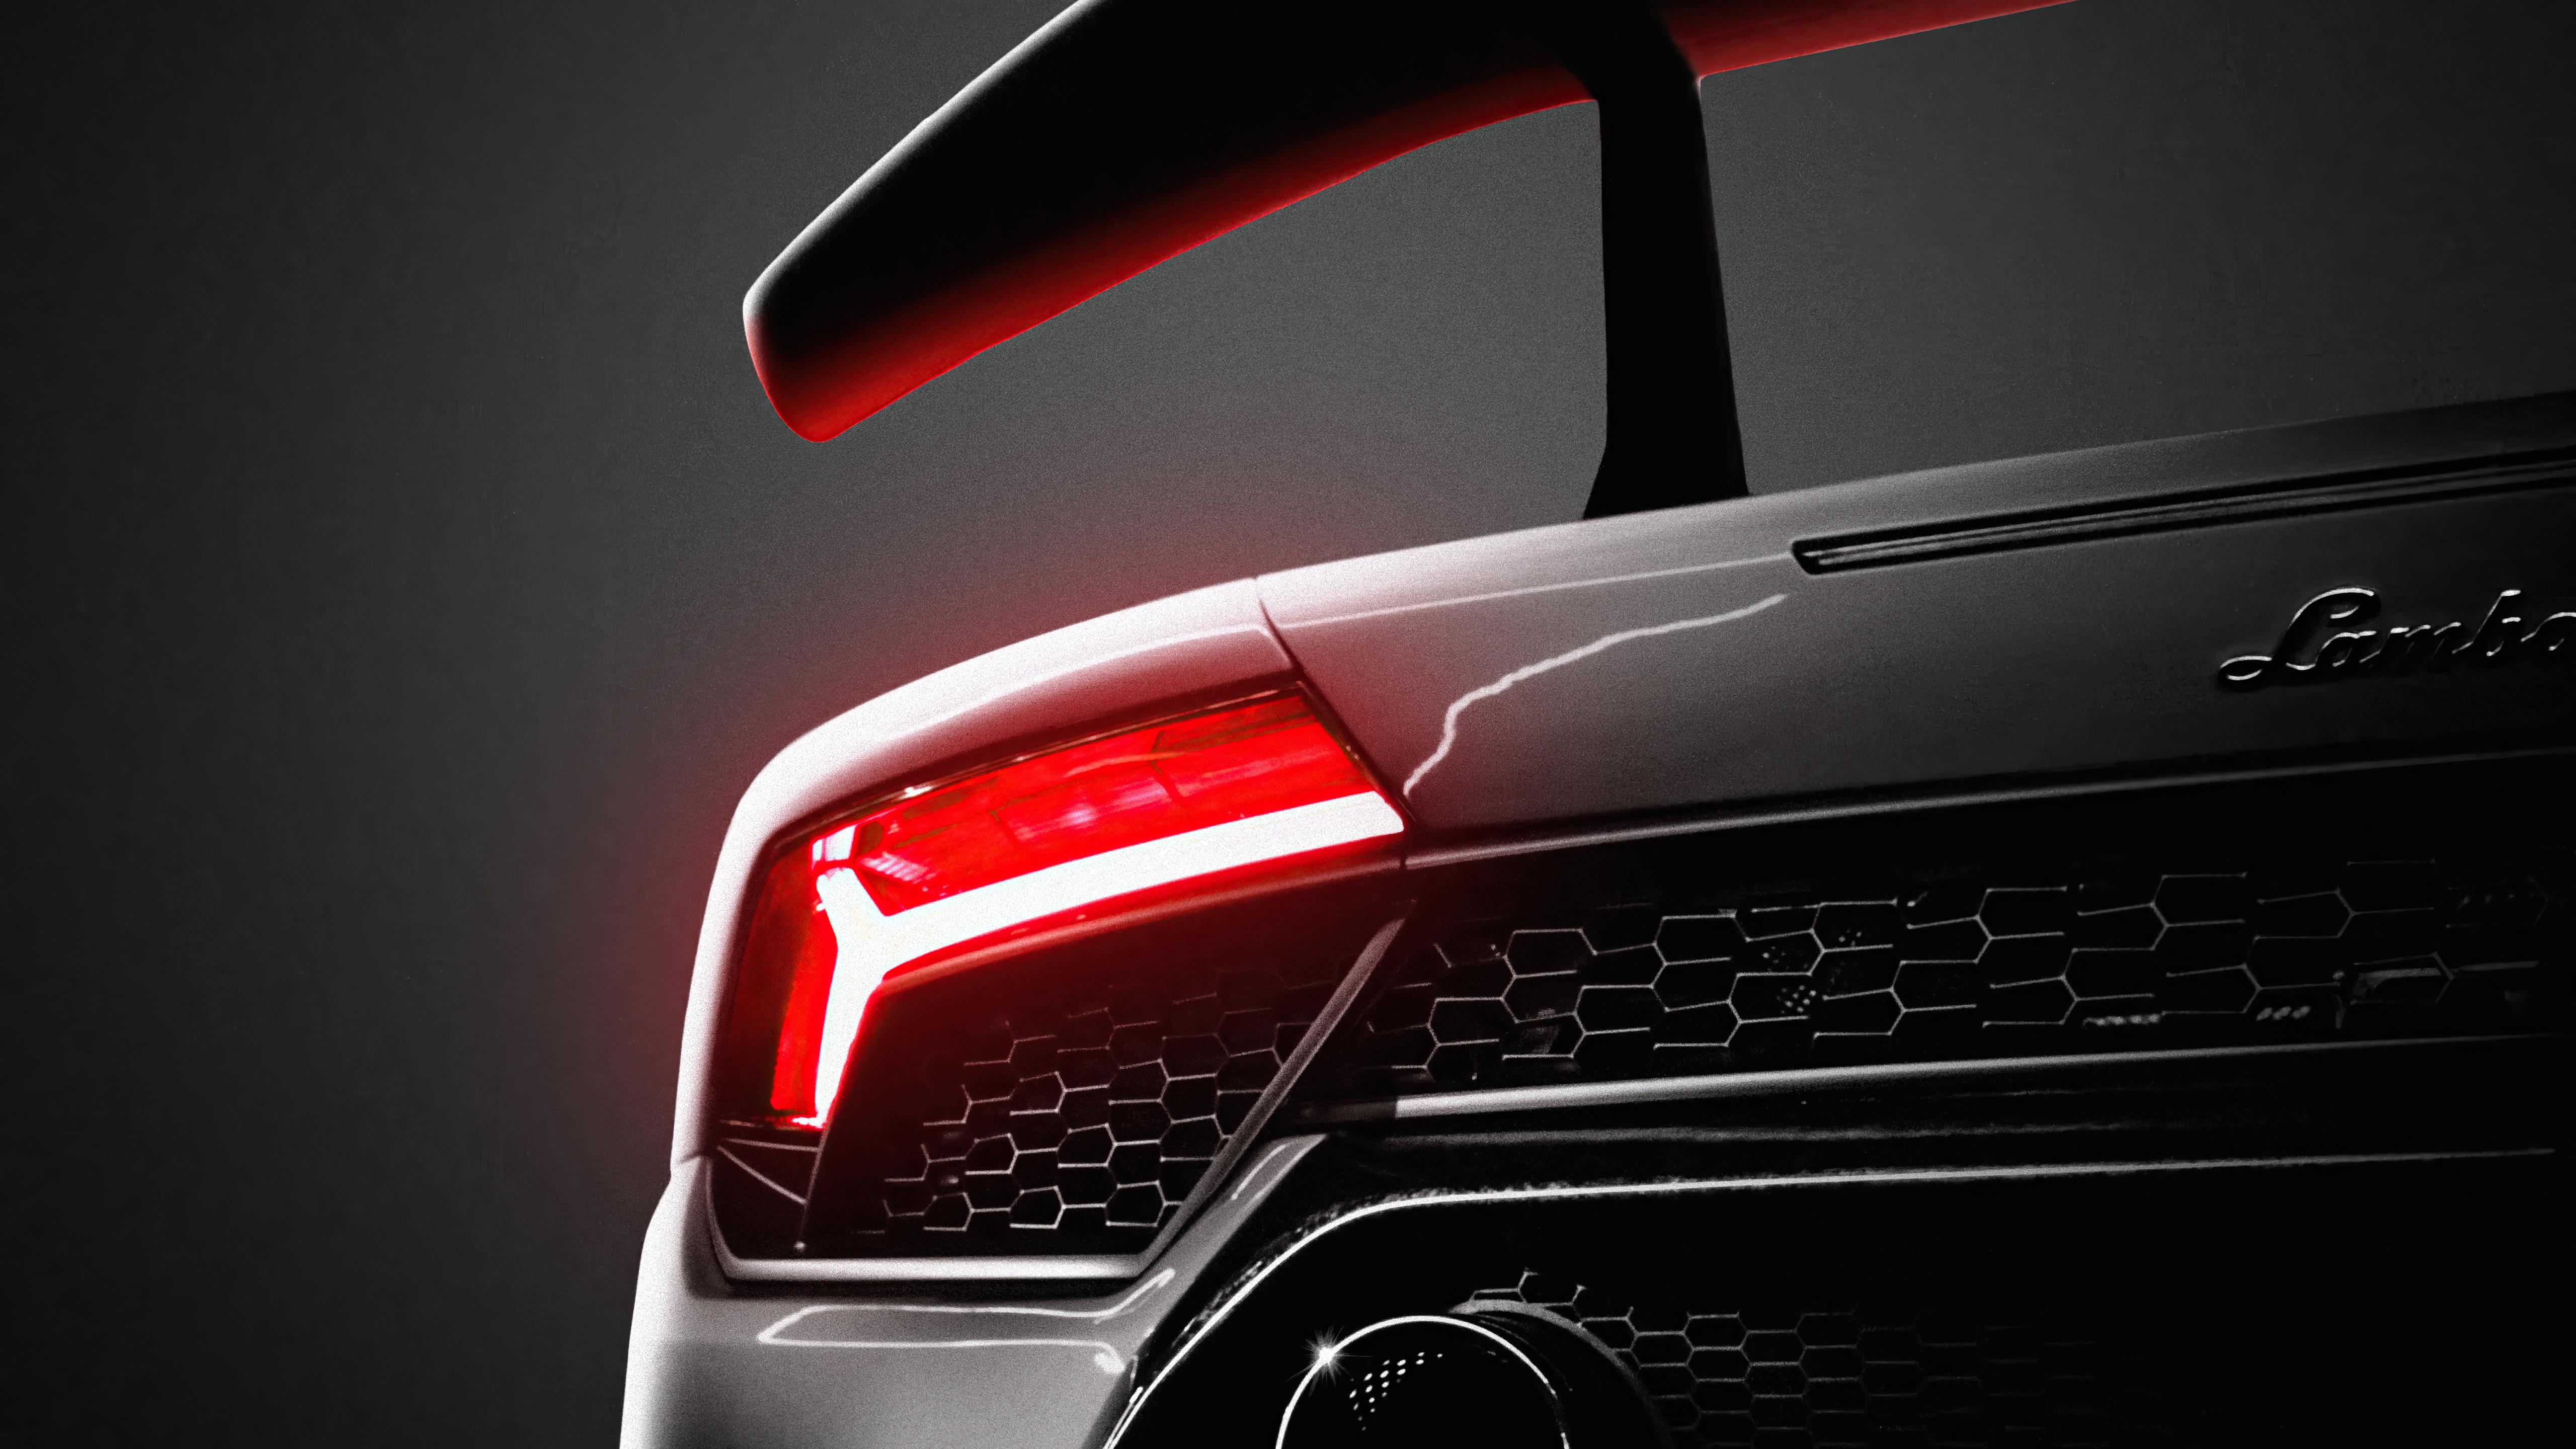 lamborghini tail light glowing 4k 1618920903 - Lamborghini Tail Light Glowing 4k - Lamborghini Tail Light Glowing 4k wallpapers